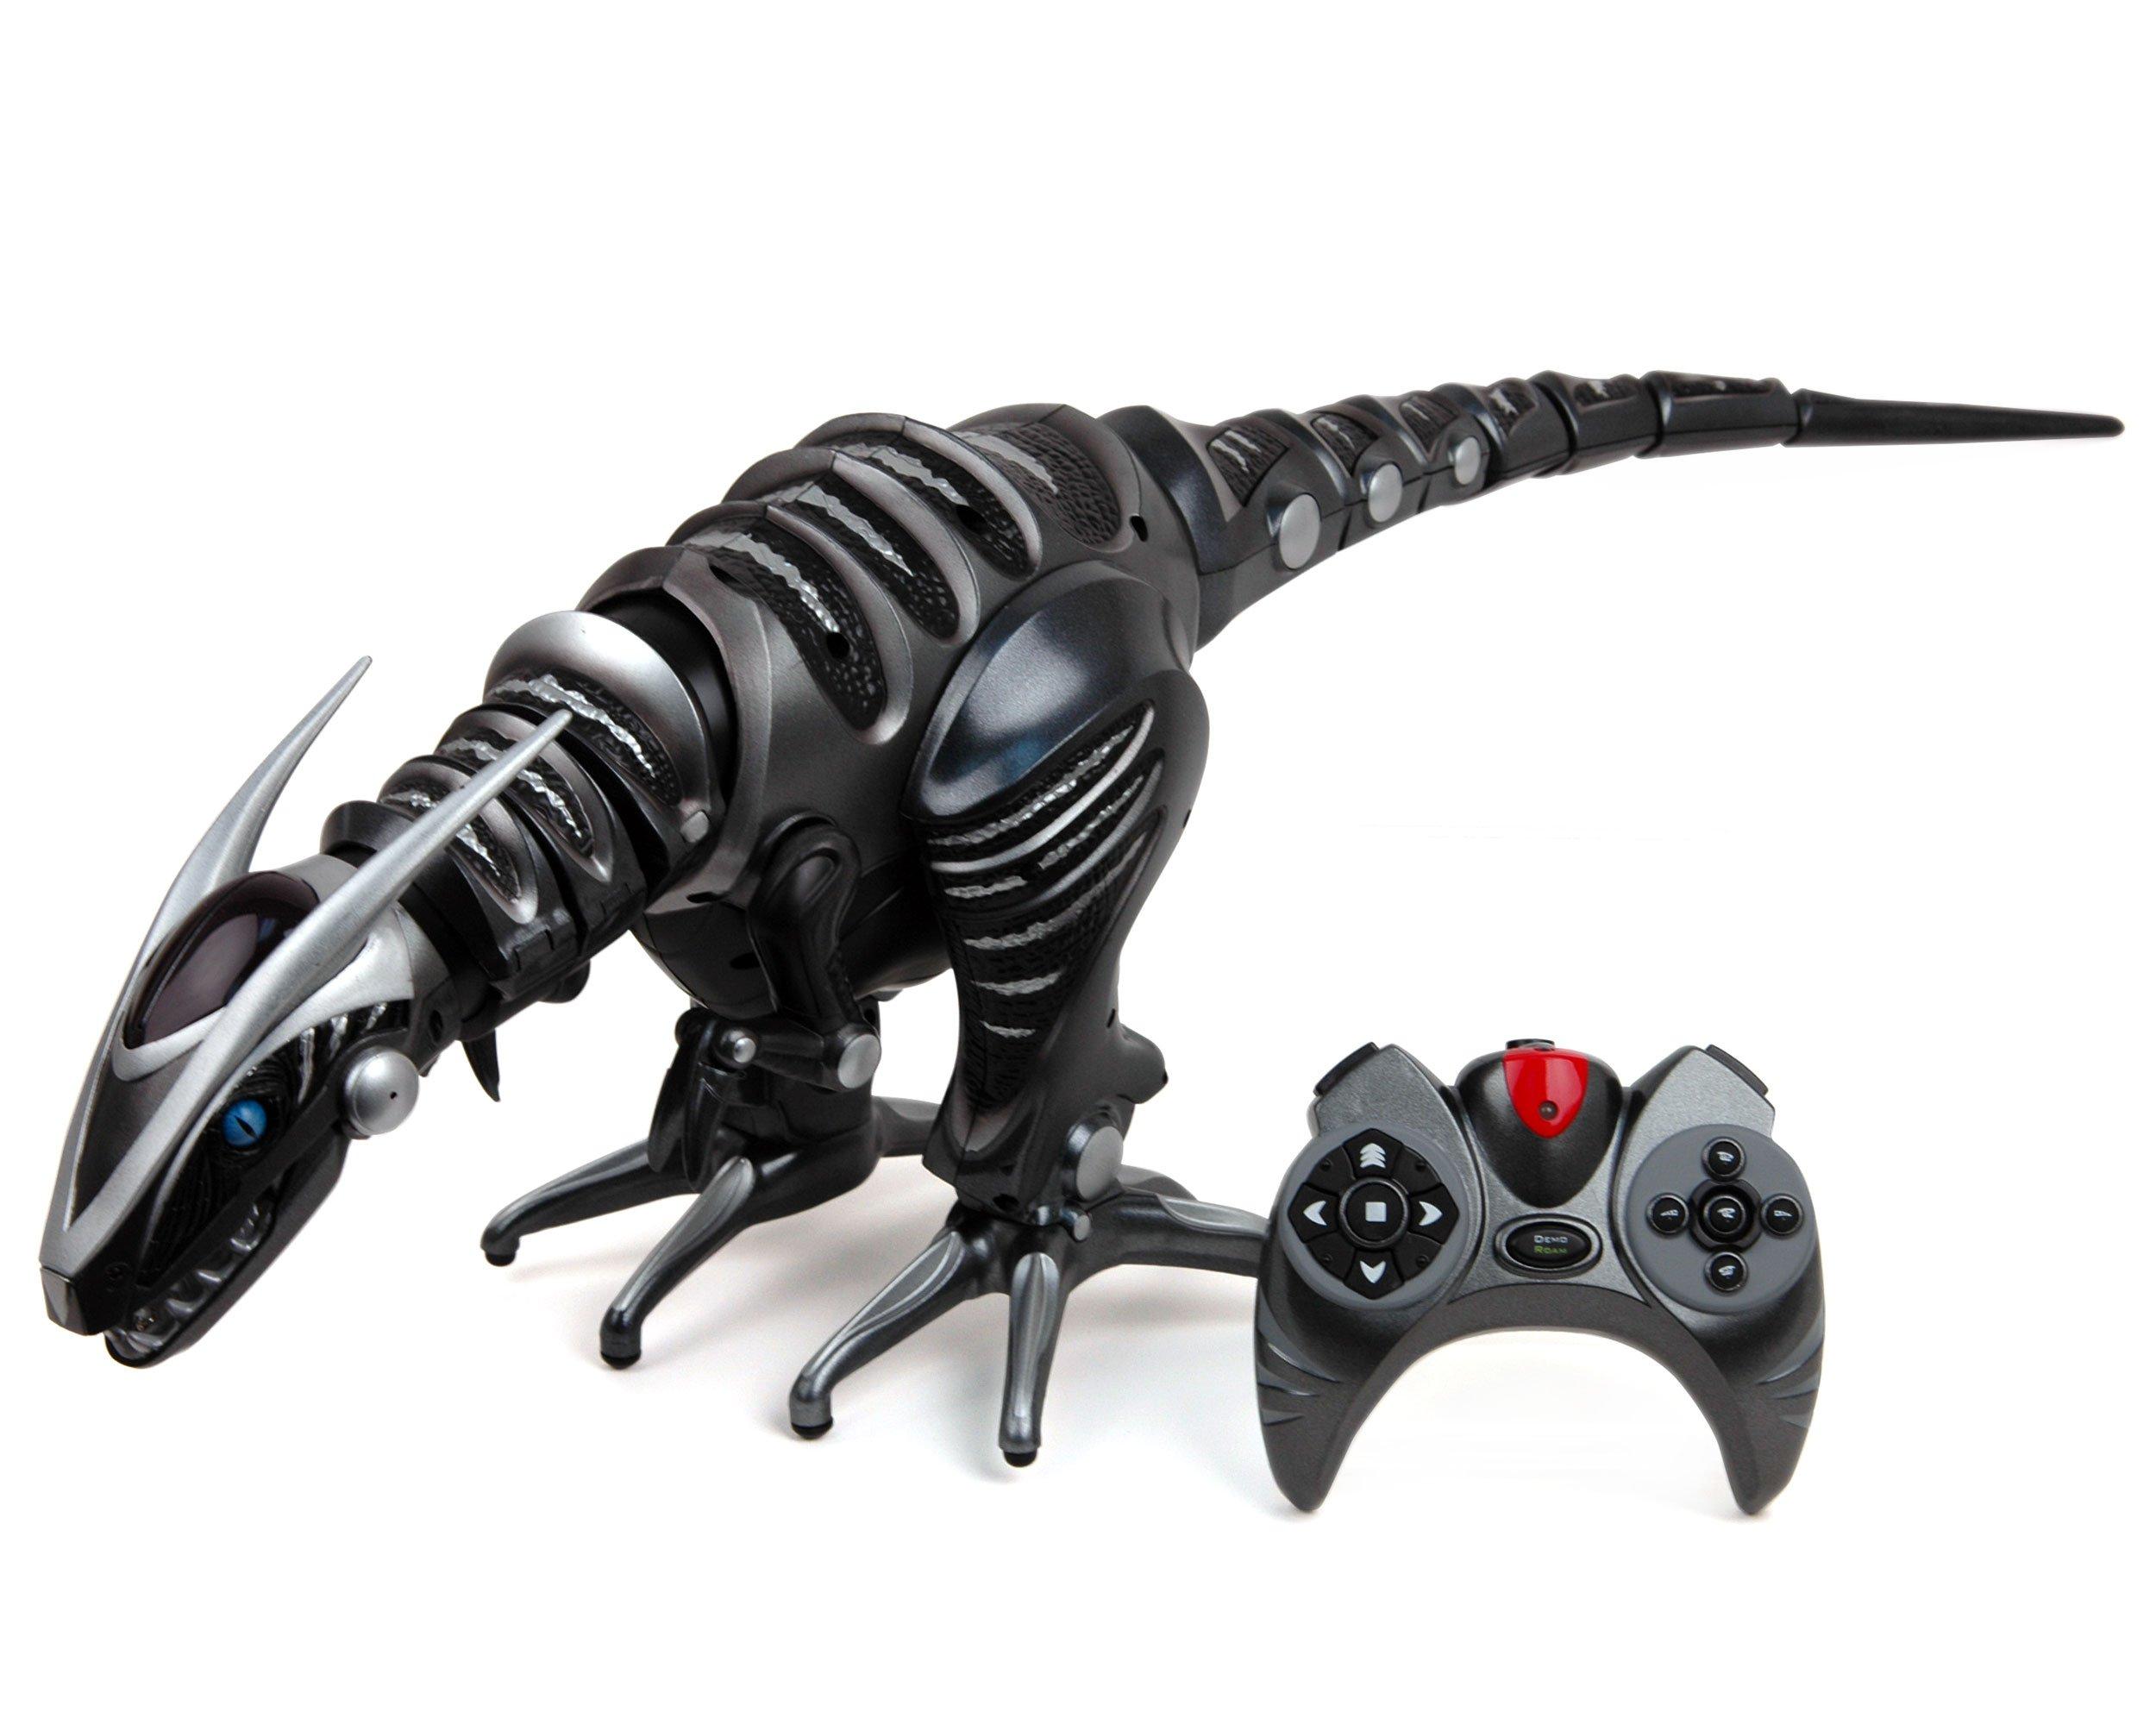 WowWee Roboraptor Toy, Metallic Black by WowWee (Image #1)